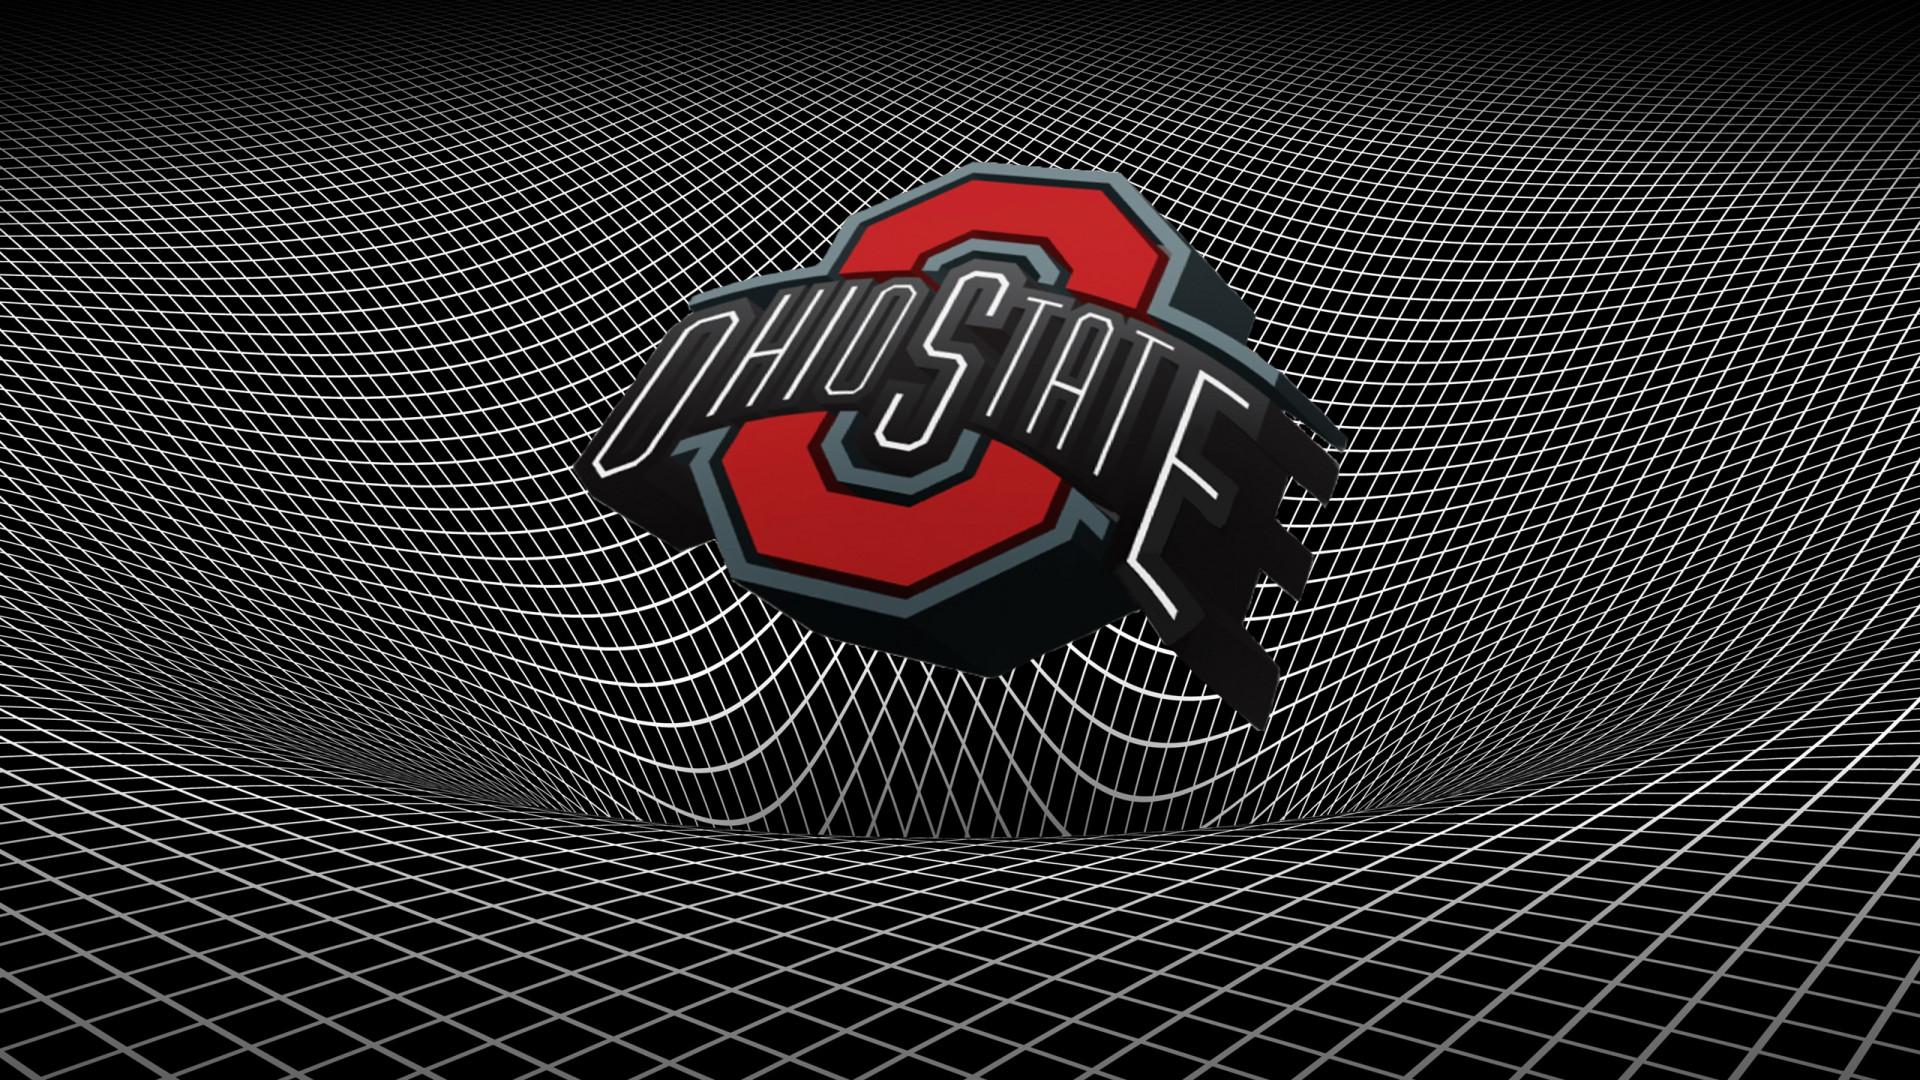 HD ohio state football wallpaper   Wallpaper Database. HD Ohio State Football Wallpaper   WallpaperSafari